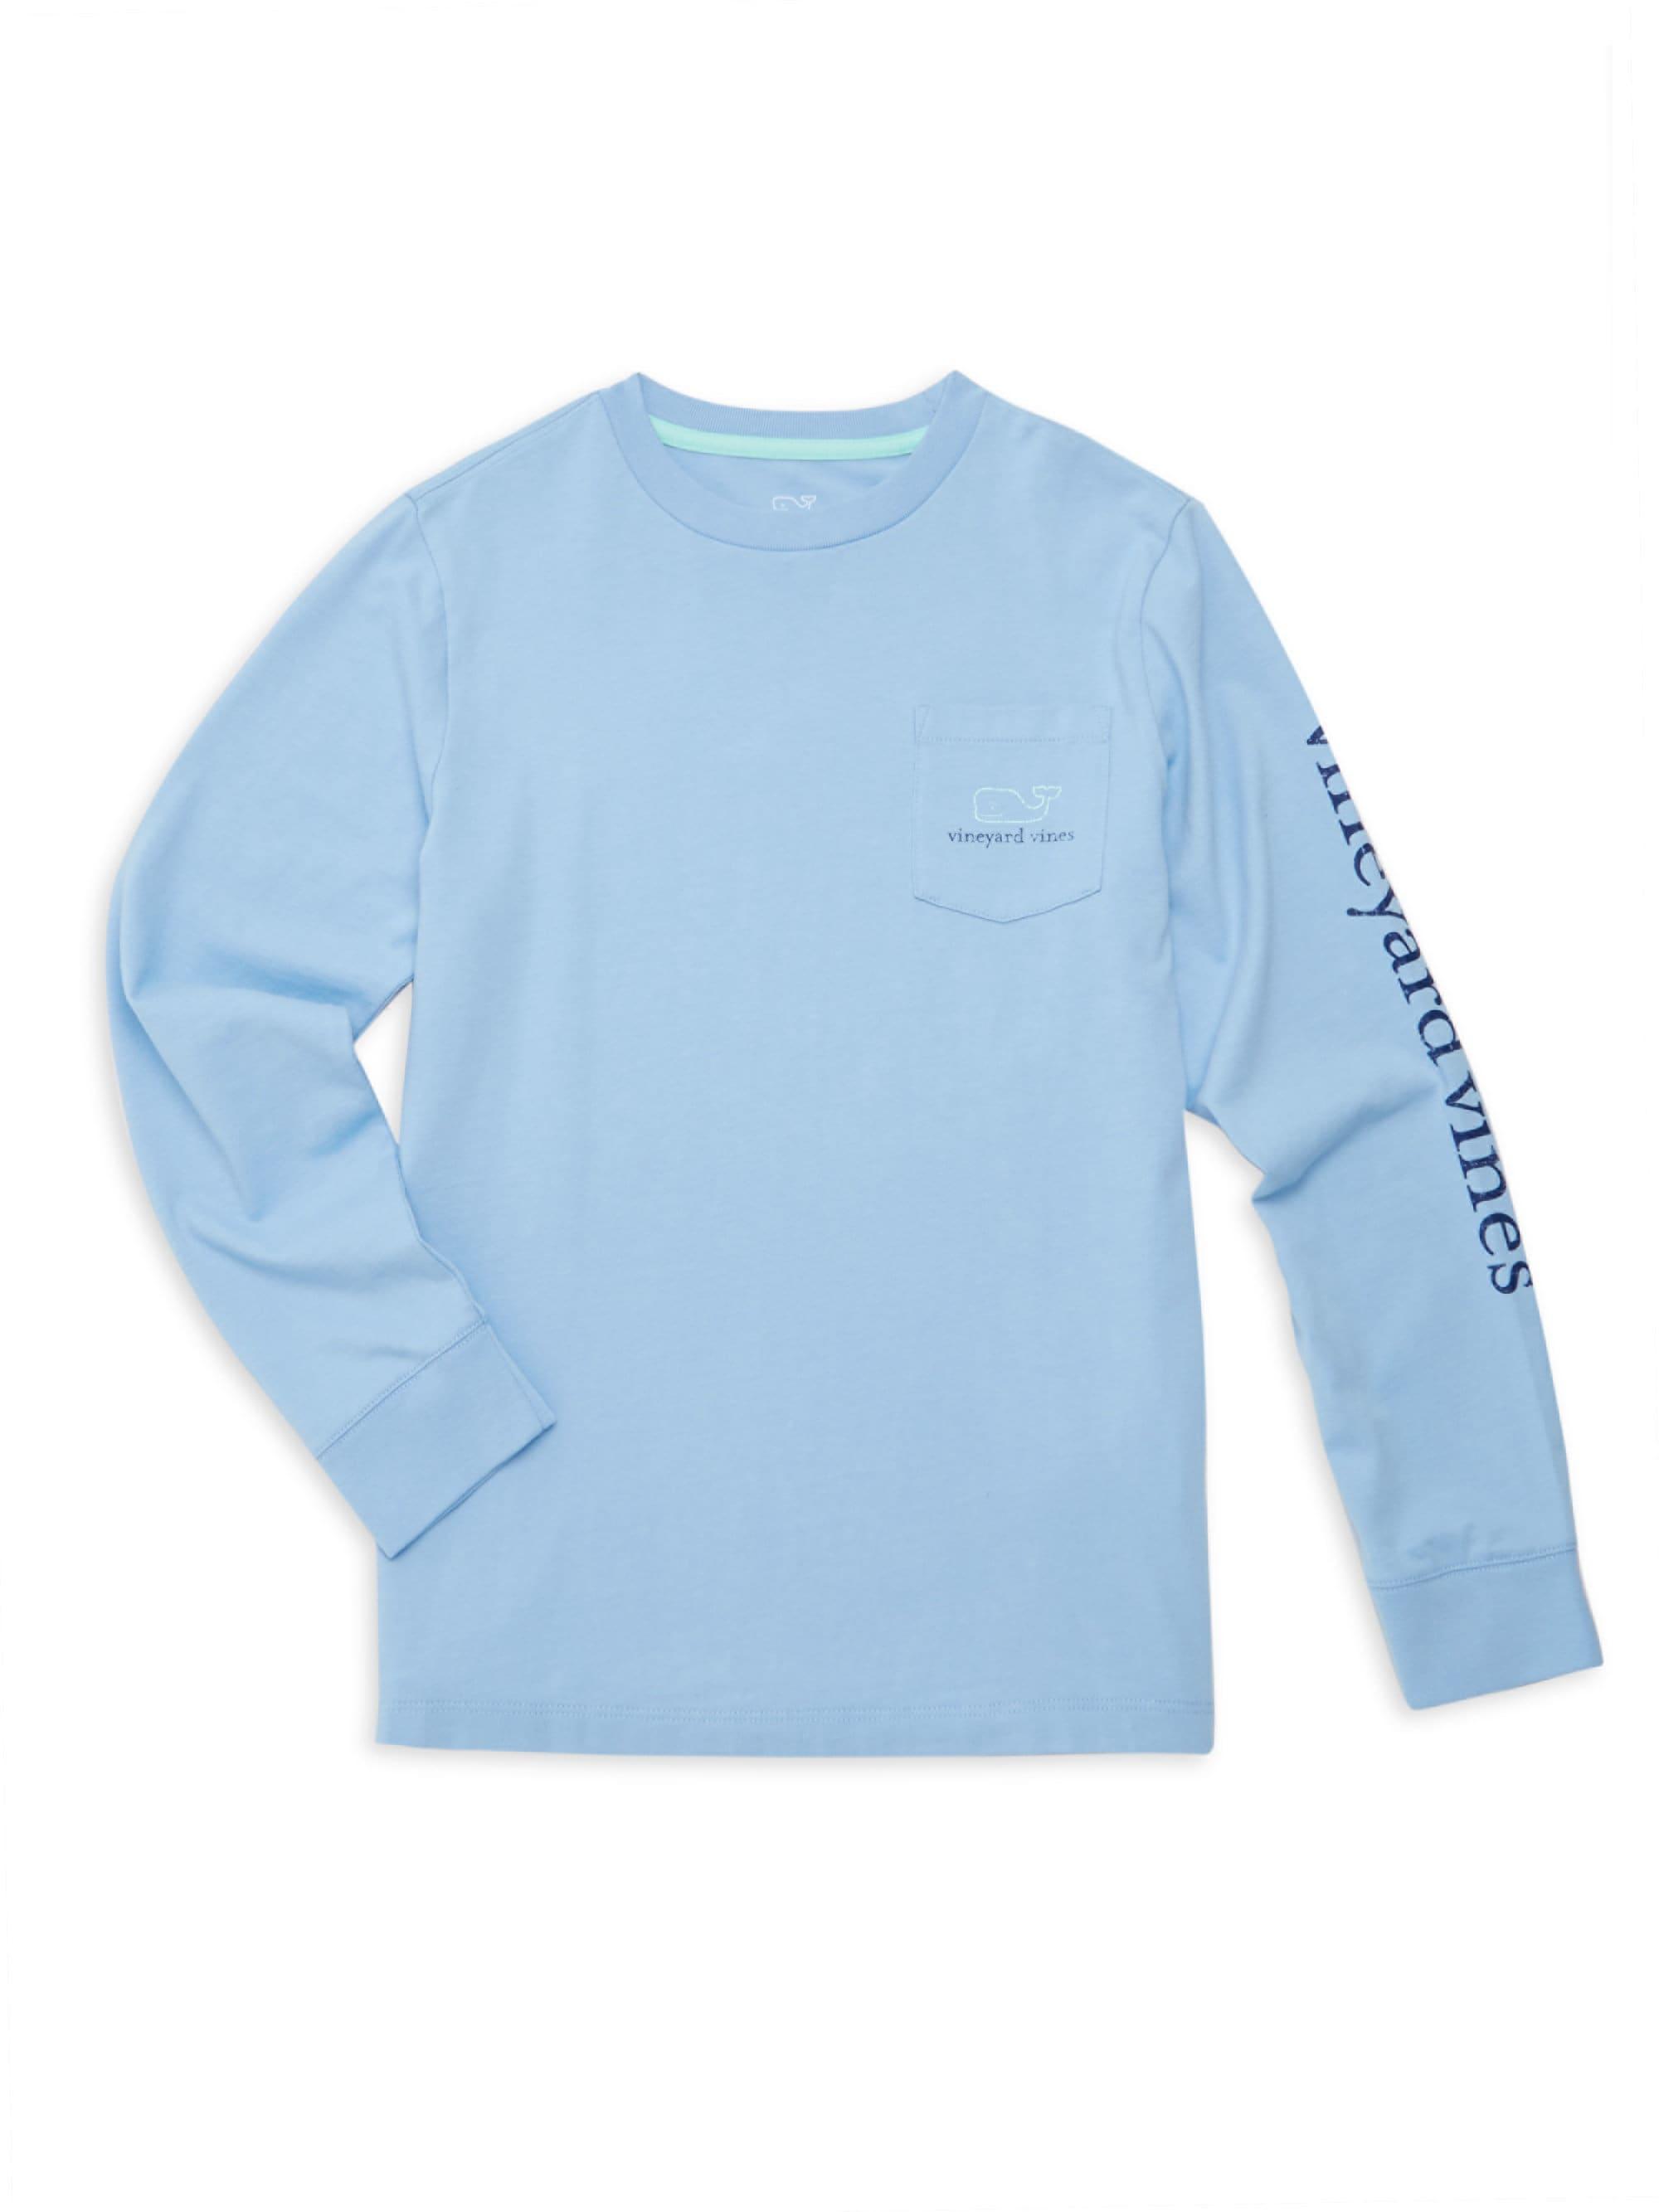 1649d384 Vineyard Vines Little Boy's & Boy's Graphic Long Sleeve T-shirt ...